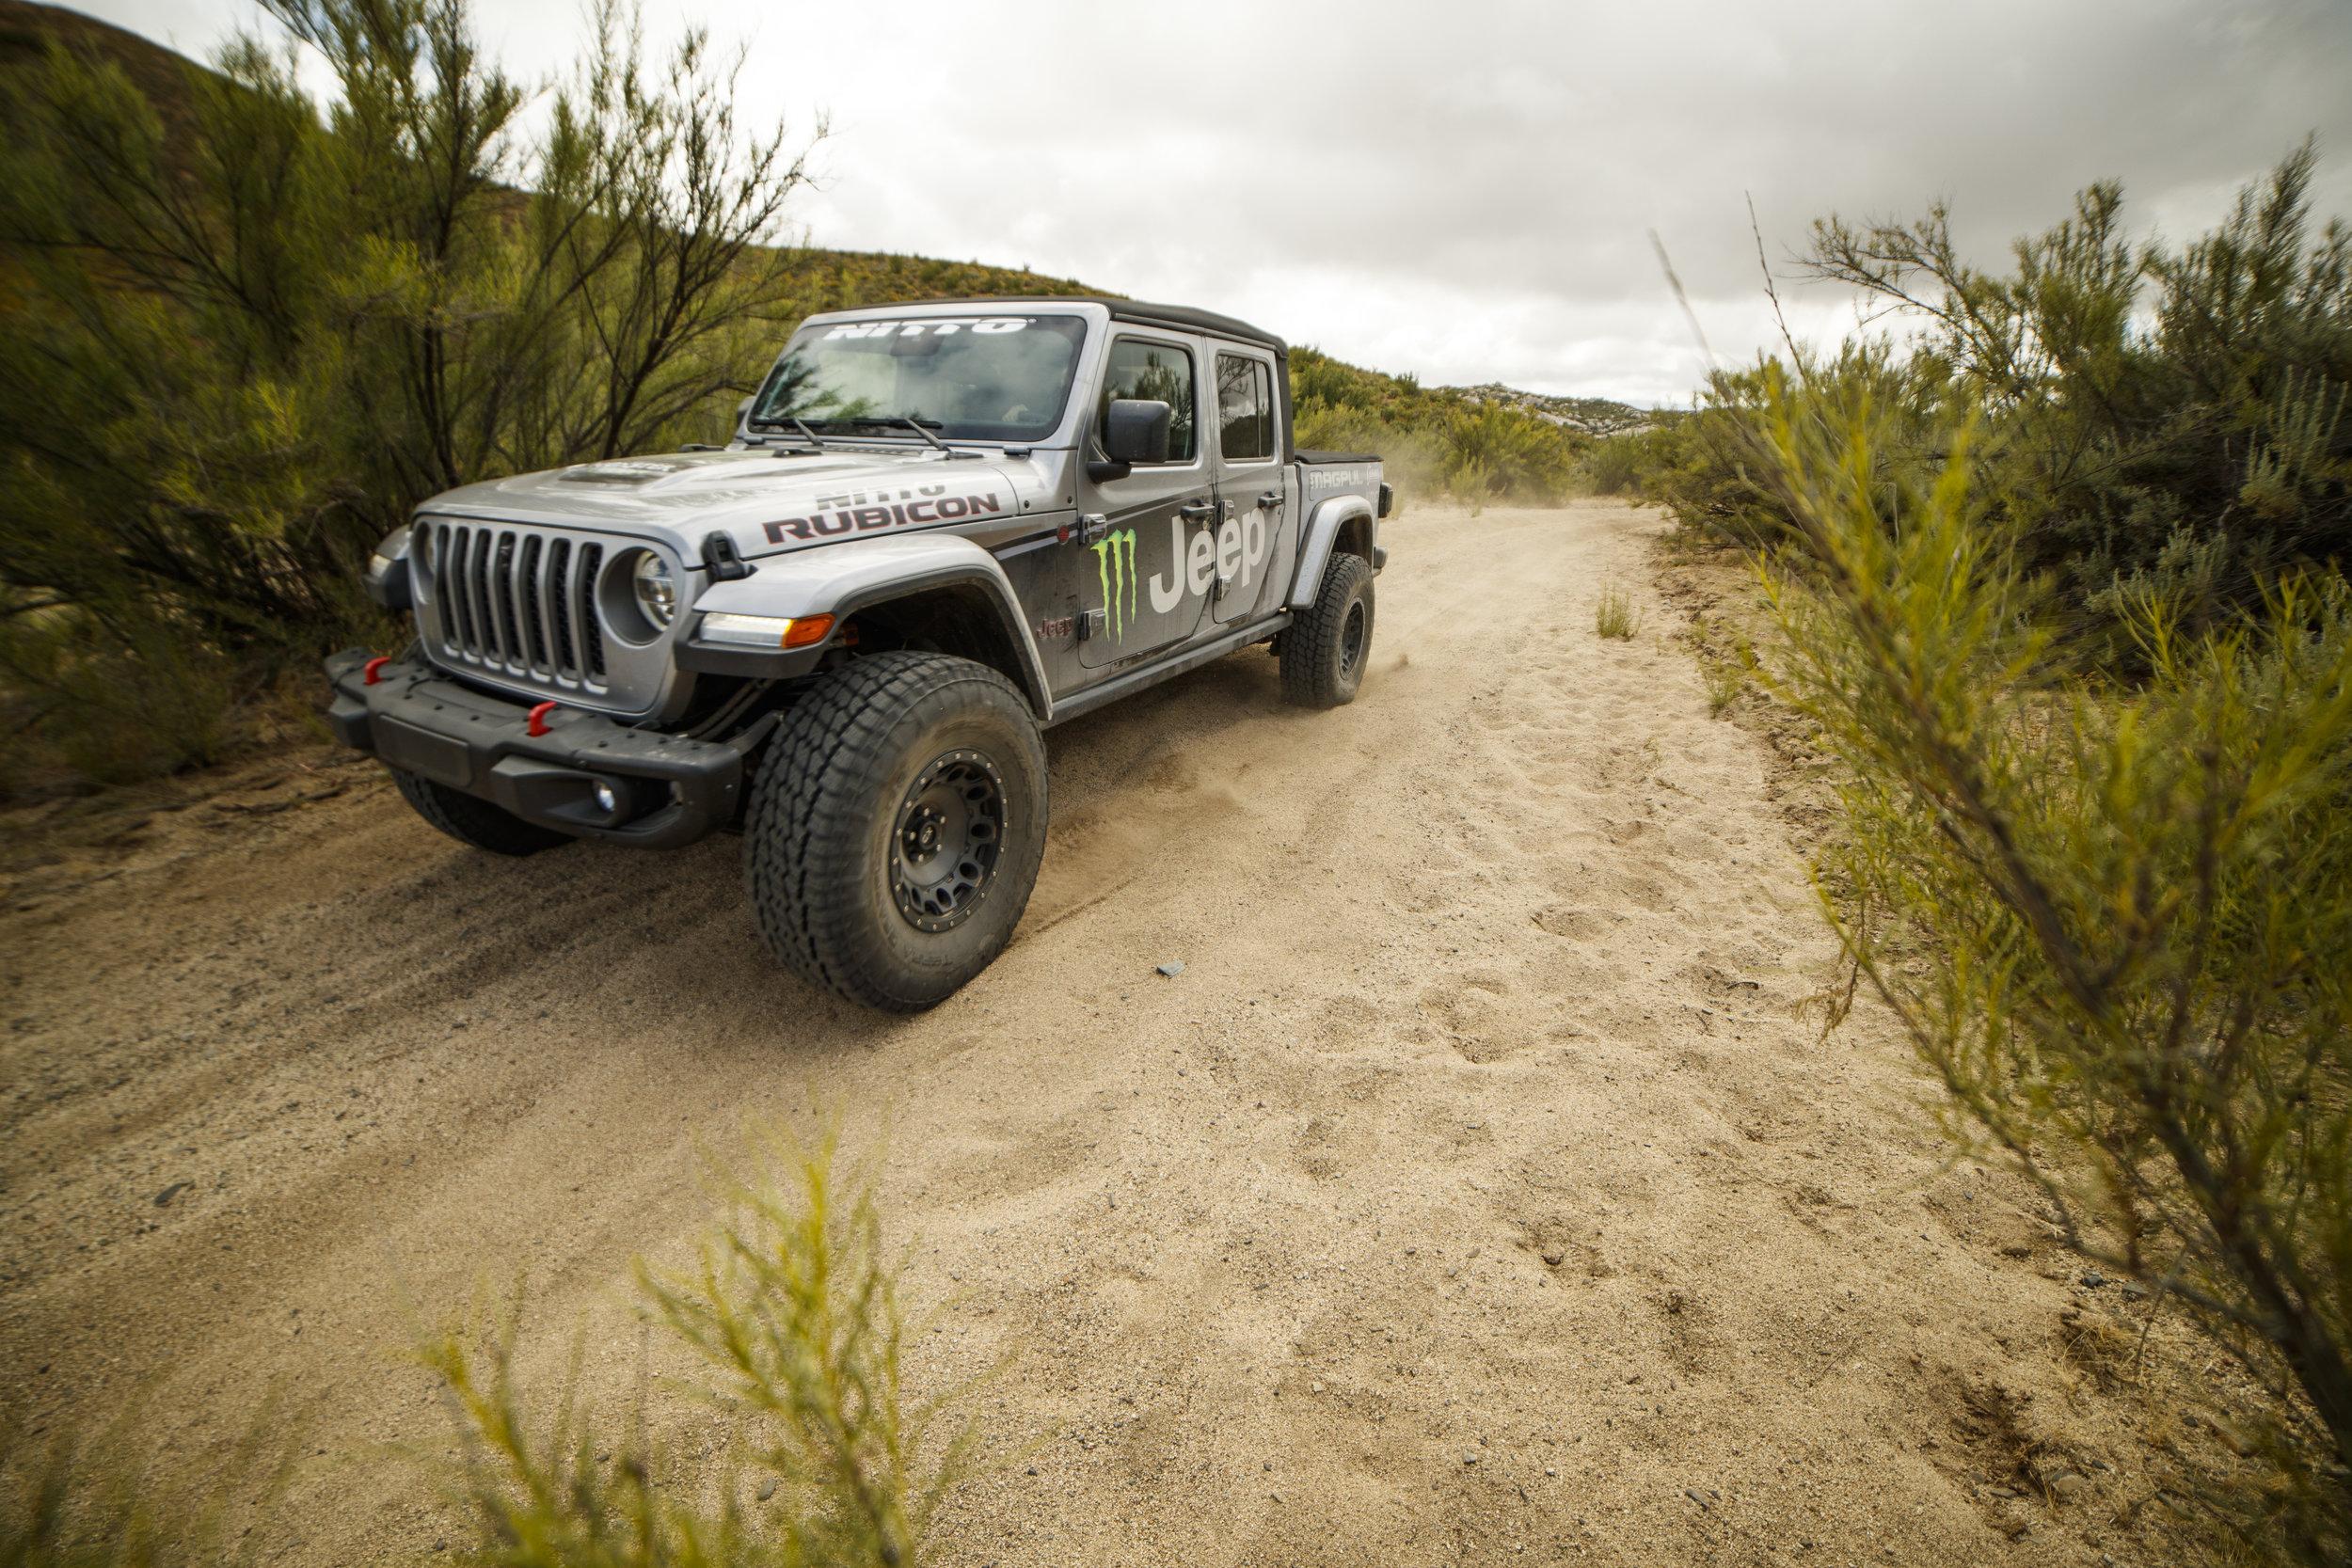 6_24_CaseyCurrie_Baja500PreRunning_BajaMexico_Jeep_011.jpg